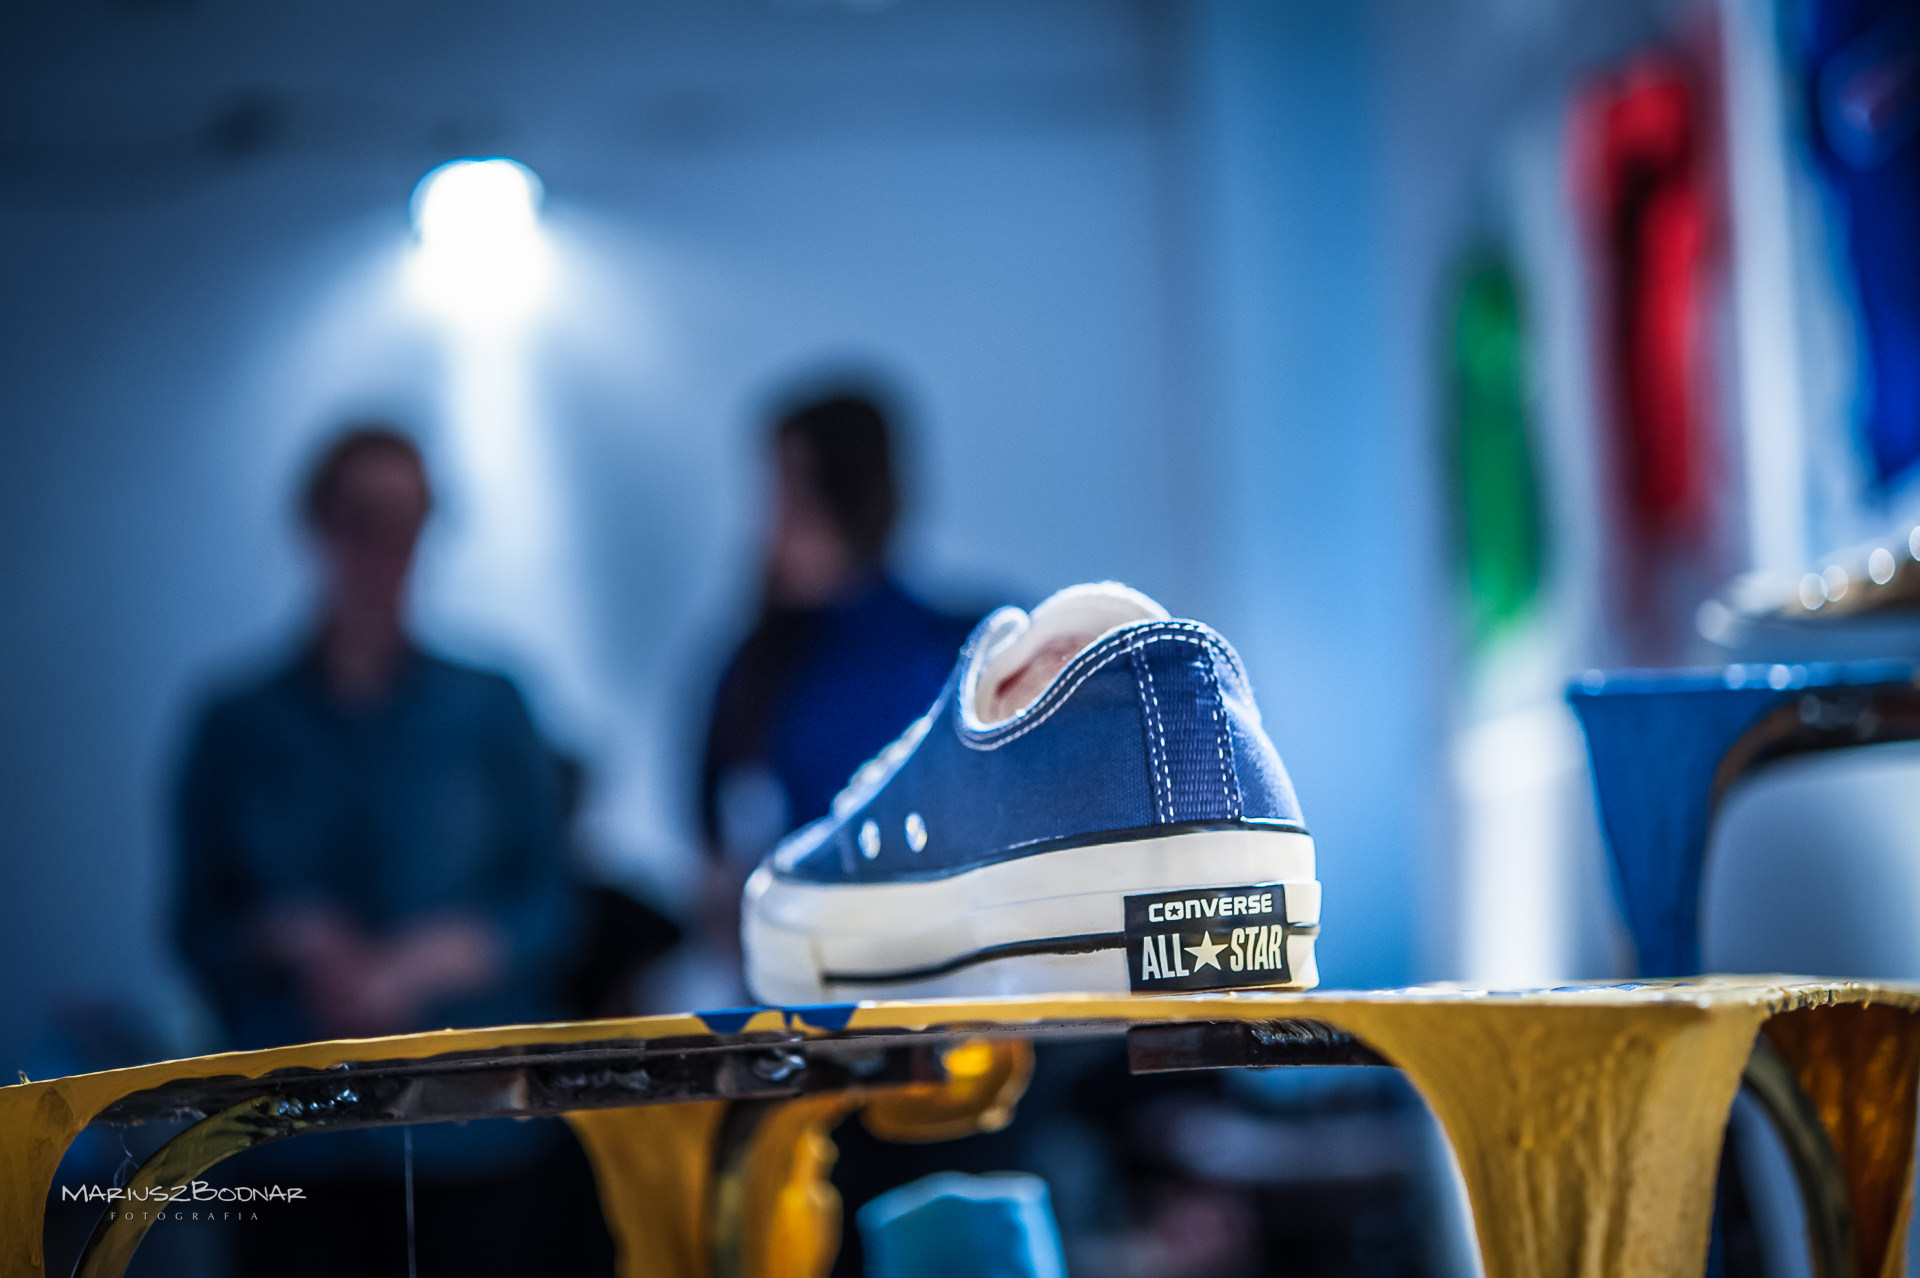 prezentacja kolekcji Converse